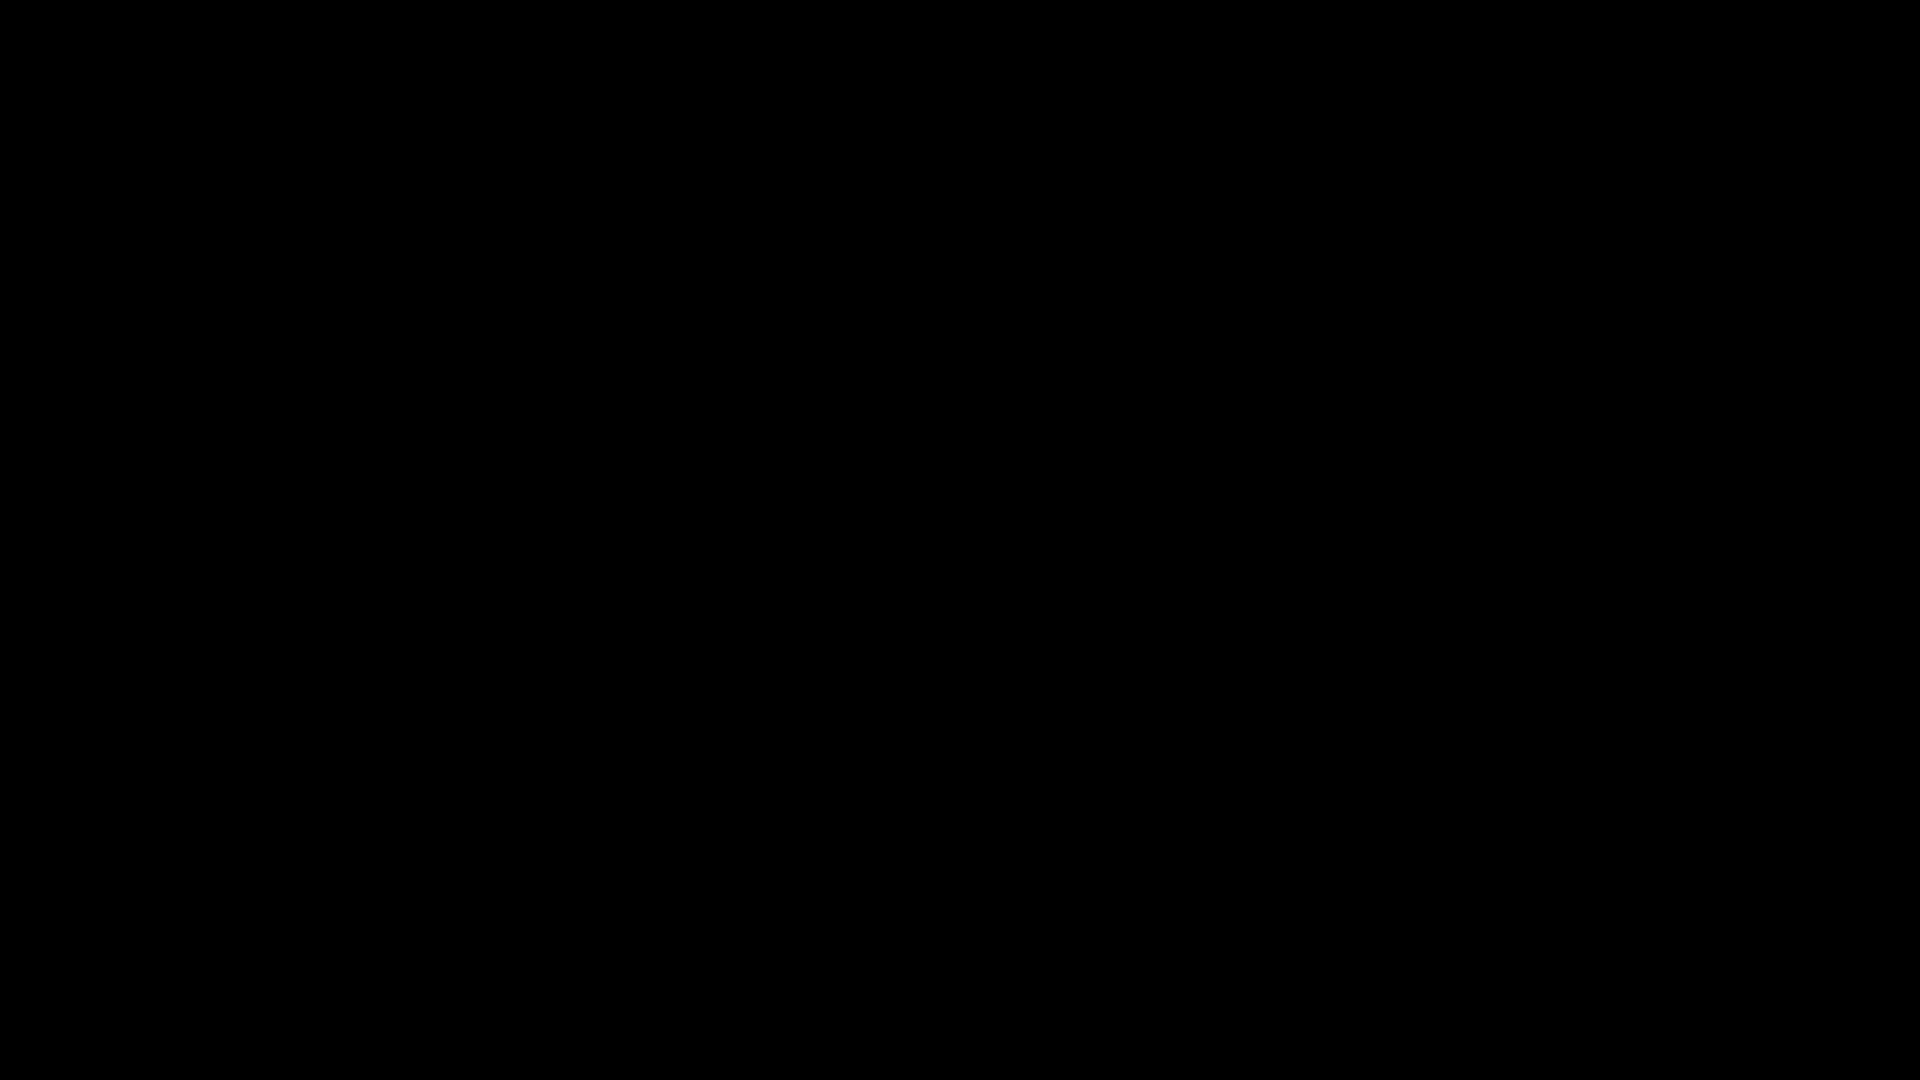 summonerswar, [3D Render] Laika Hype? GIFs